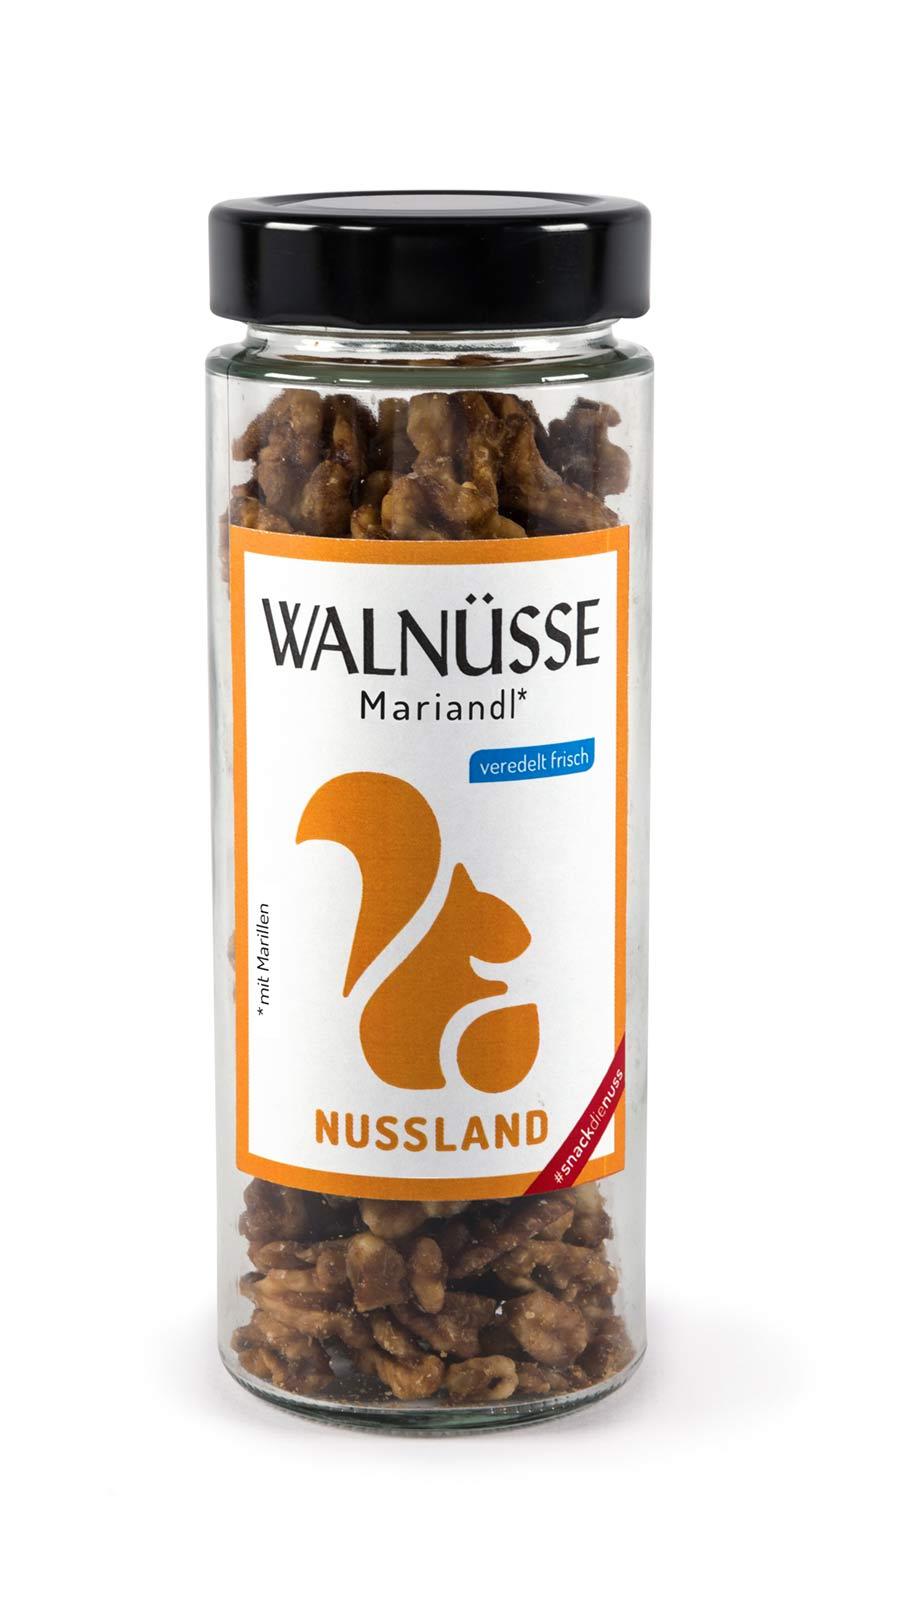 Walnuss-Snack 'Mariandl'